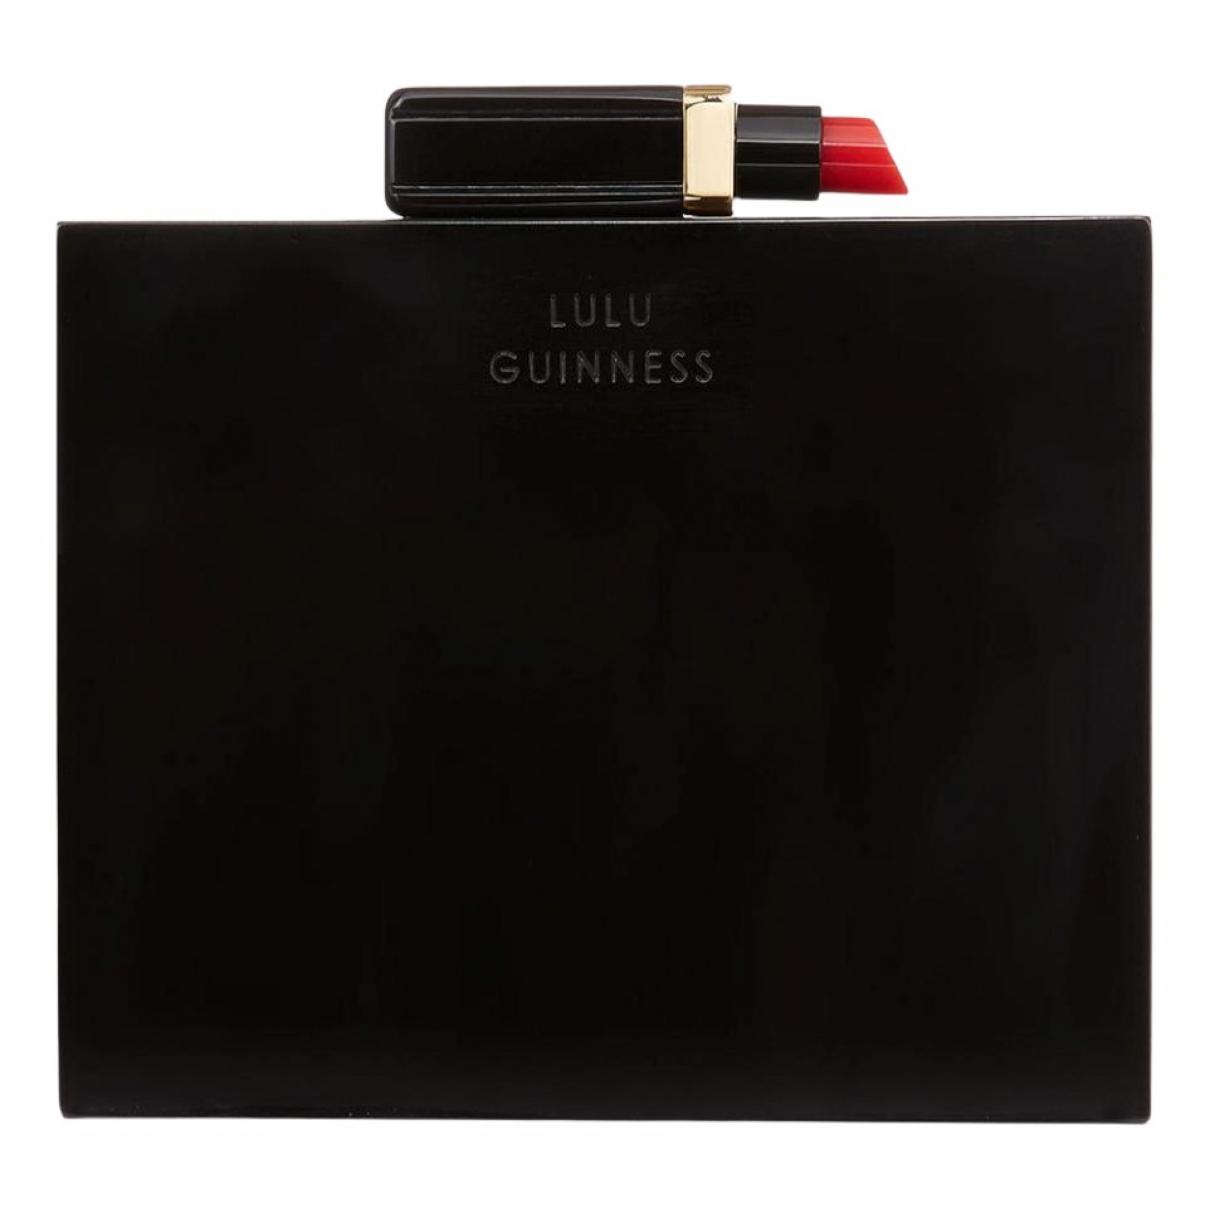 Bolsos clutch en Plastico Negro Lulu Guinness